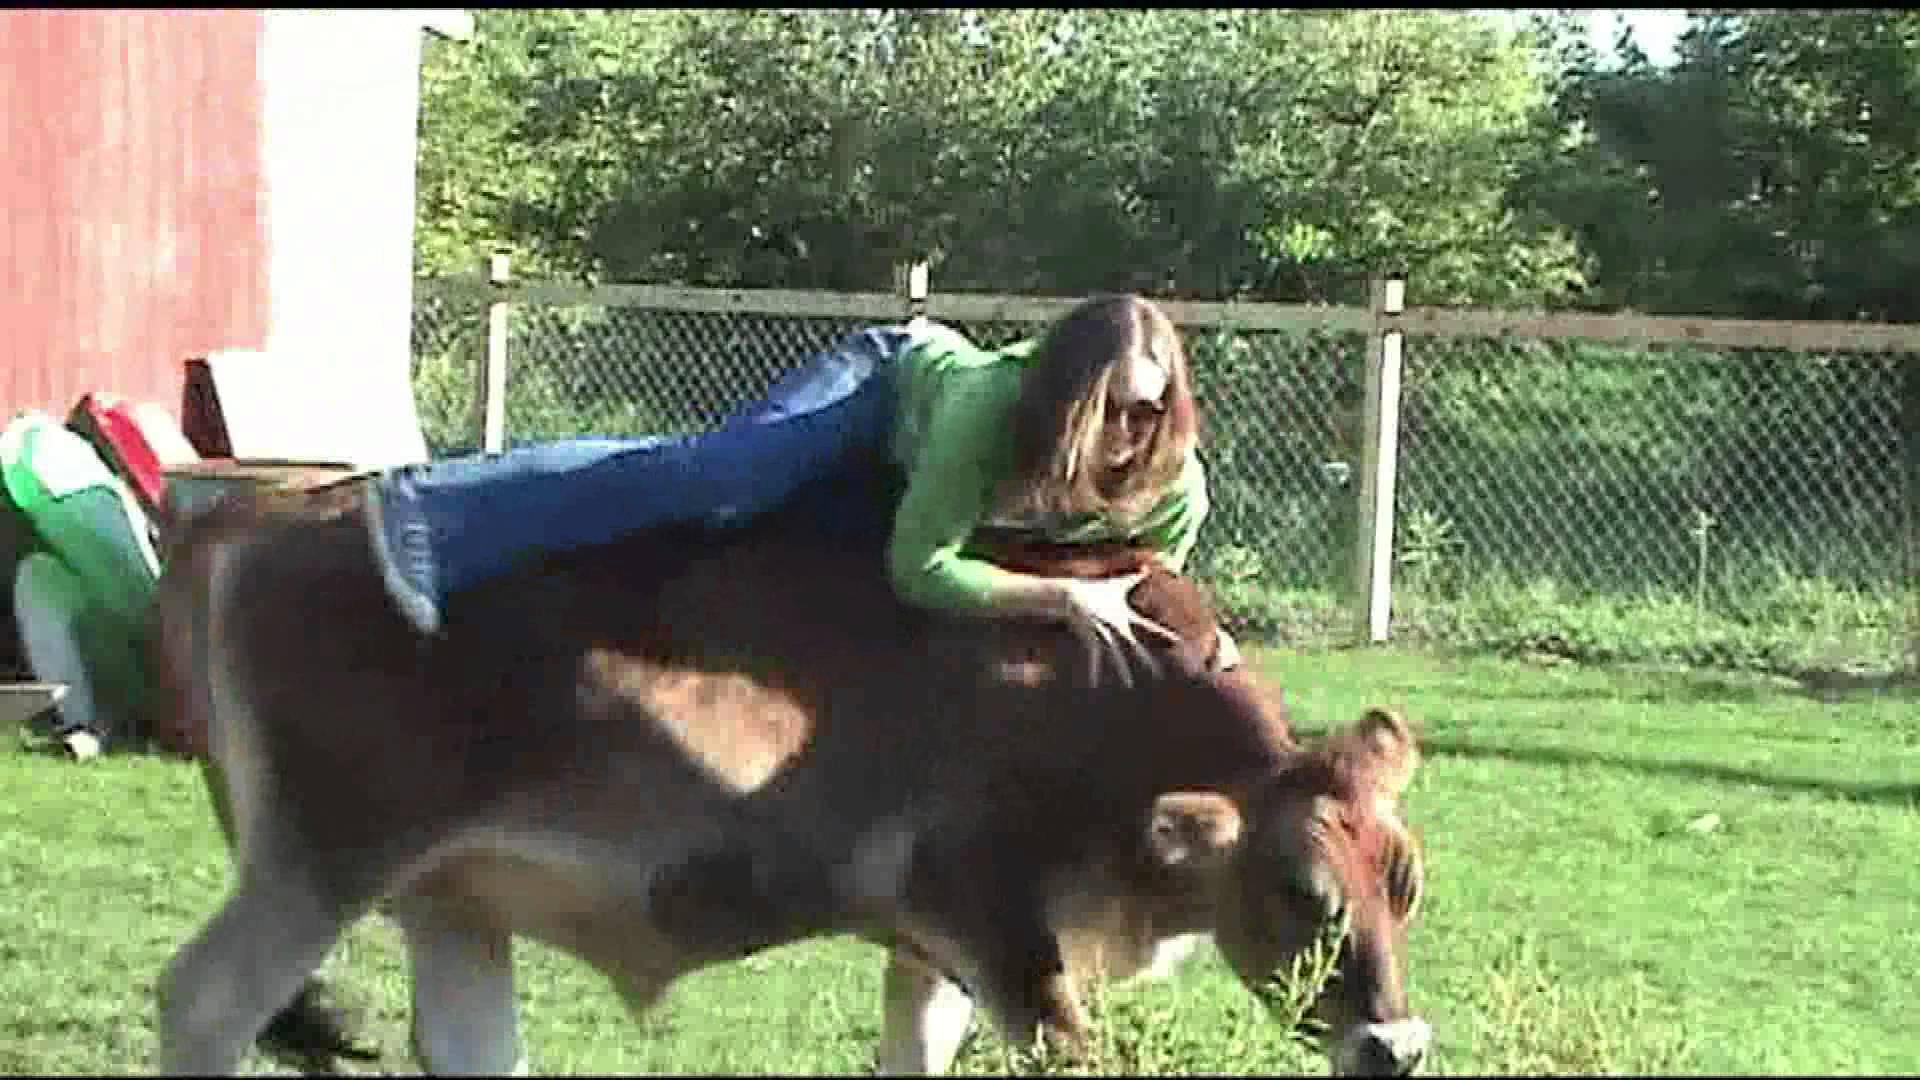 Cow ride photo